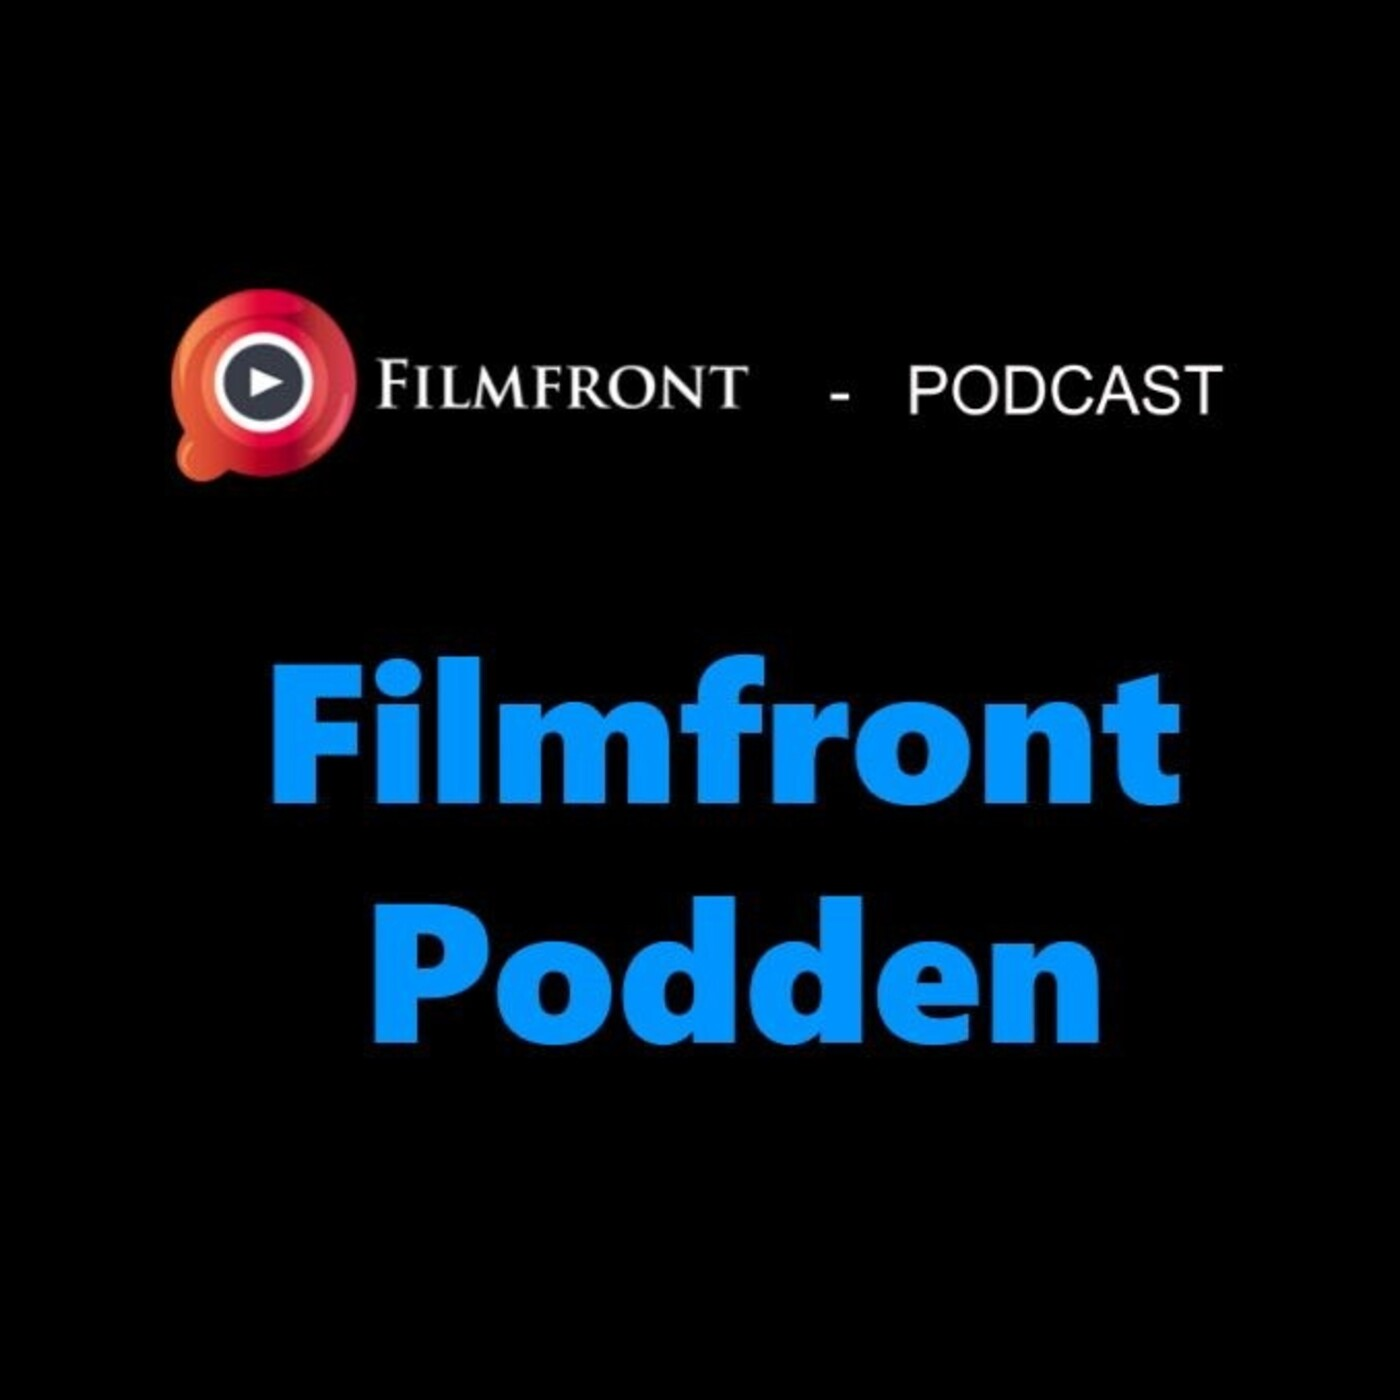 Episode 14: The Rock, Cliffhanger og Point Break - All the Colors of Cinema